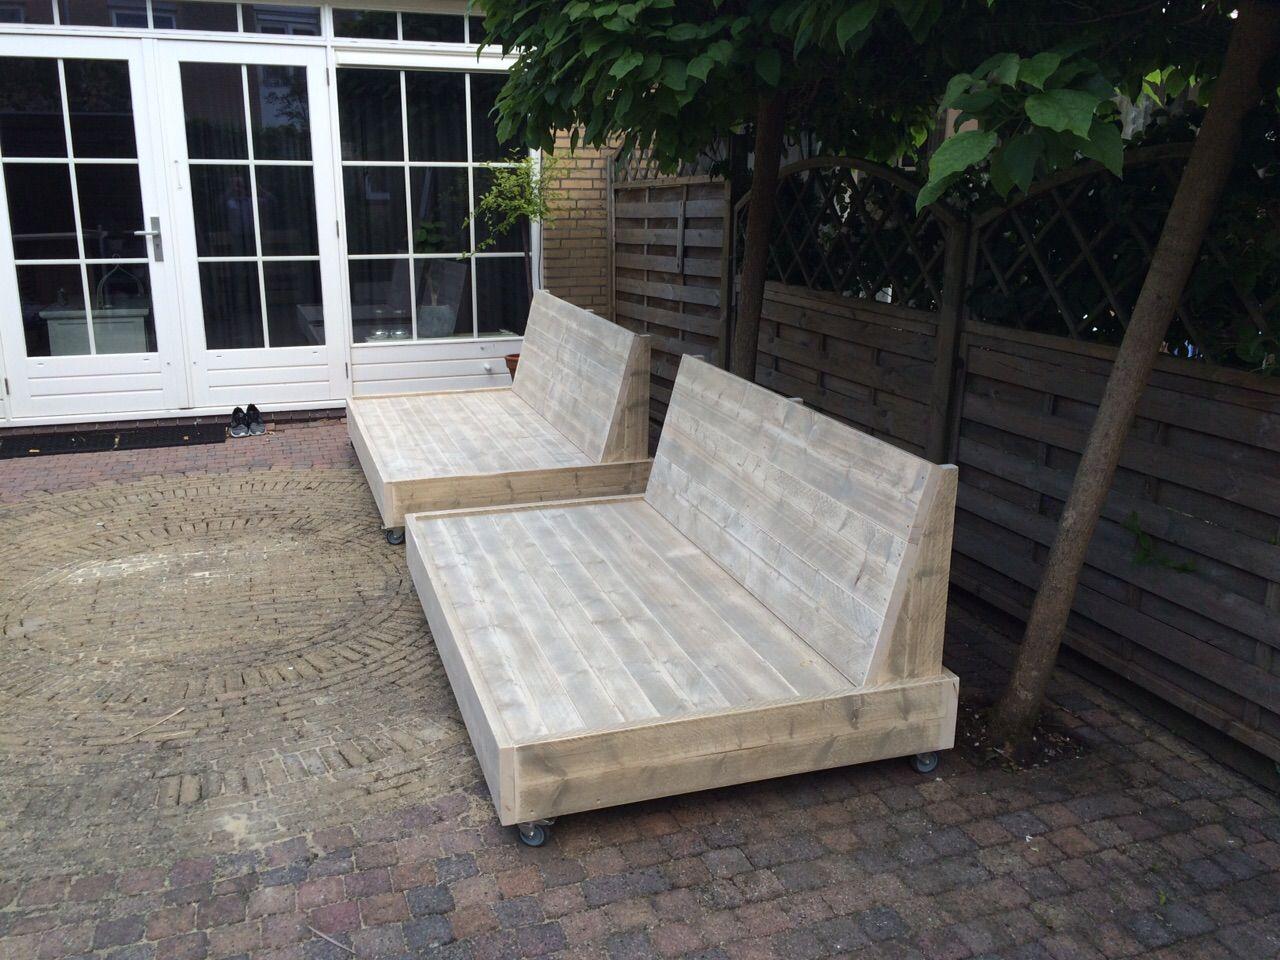 Lounge Meubelen Tuin : Loungebank steigerhout steigerhouten meubelen tuin meubelen